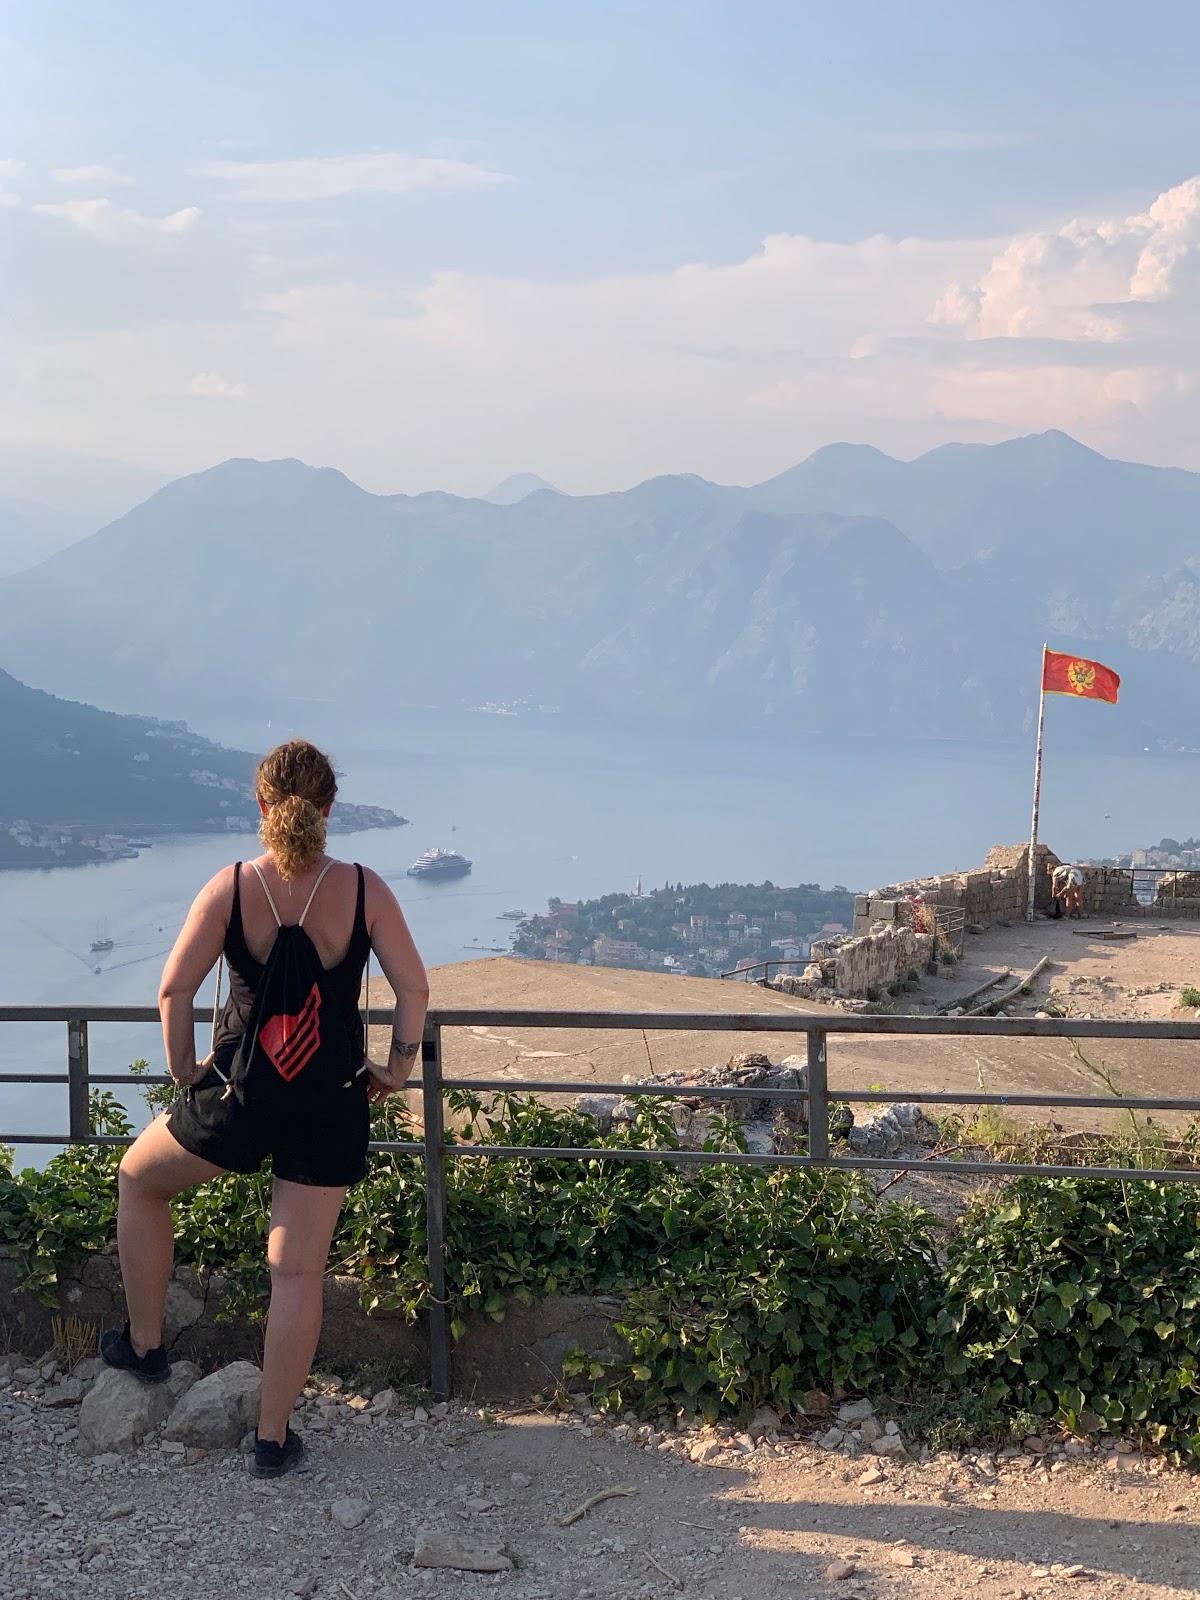 Monterail employee on sabbatical leave - Kasia in Montenegro.